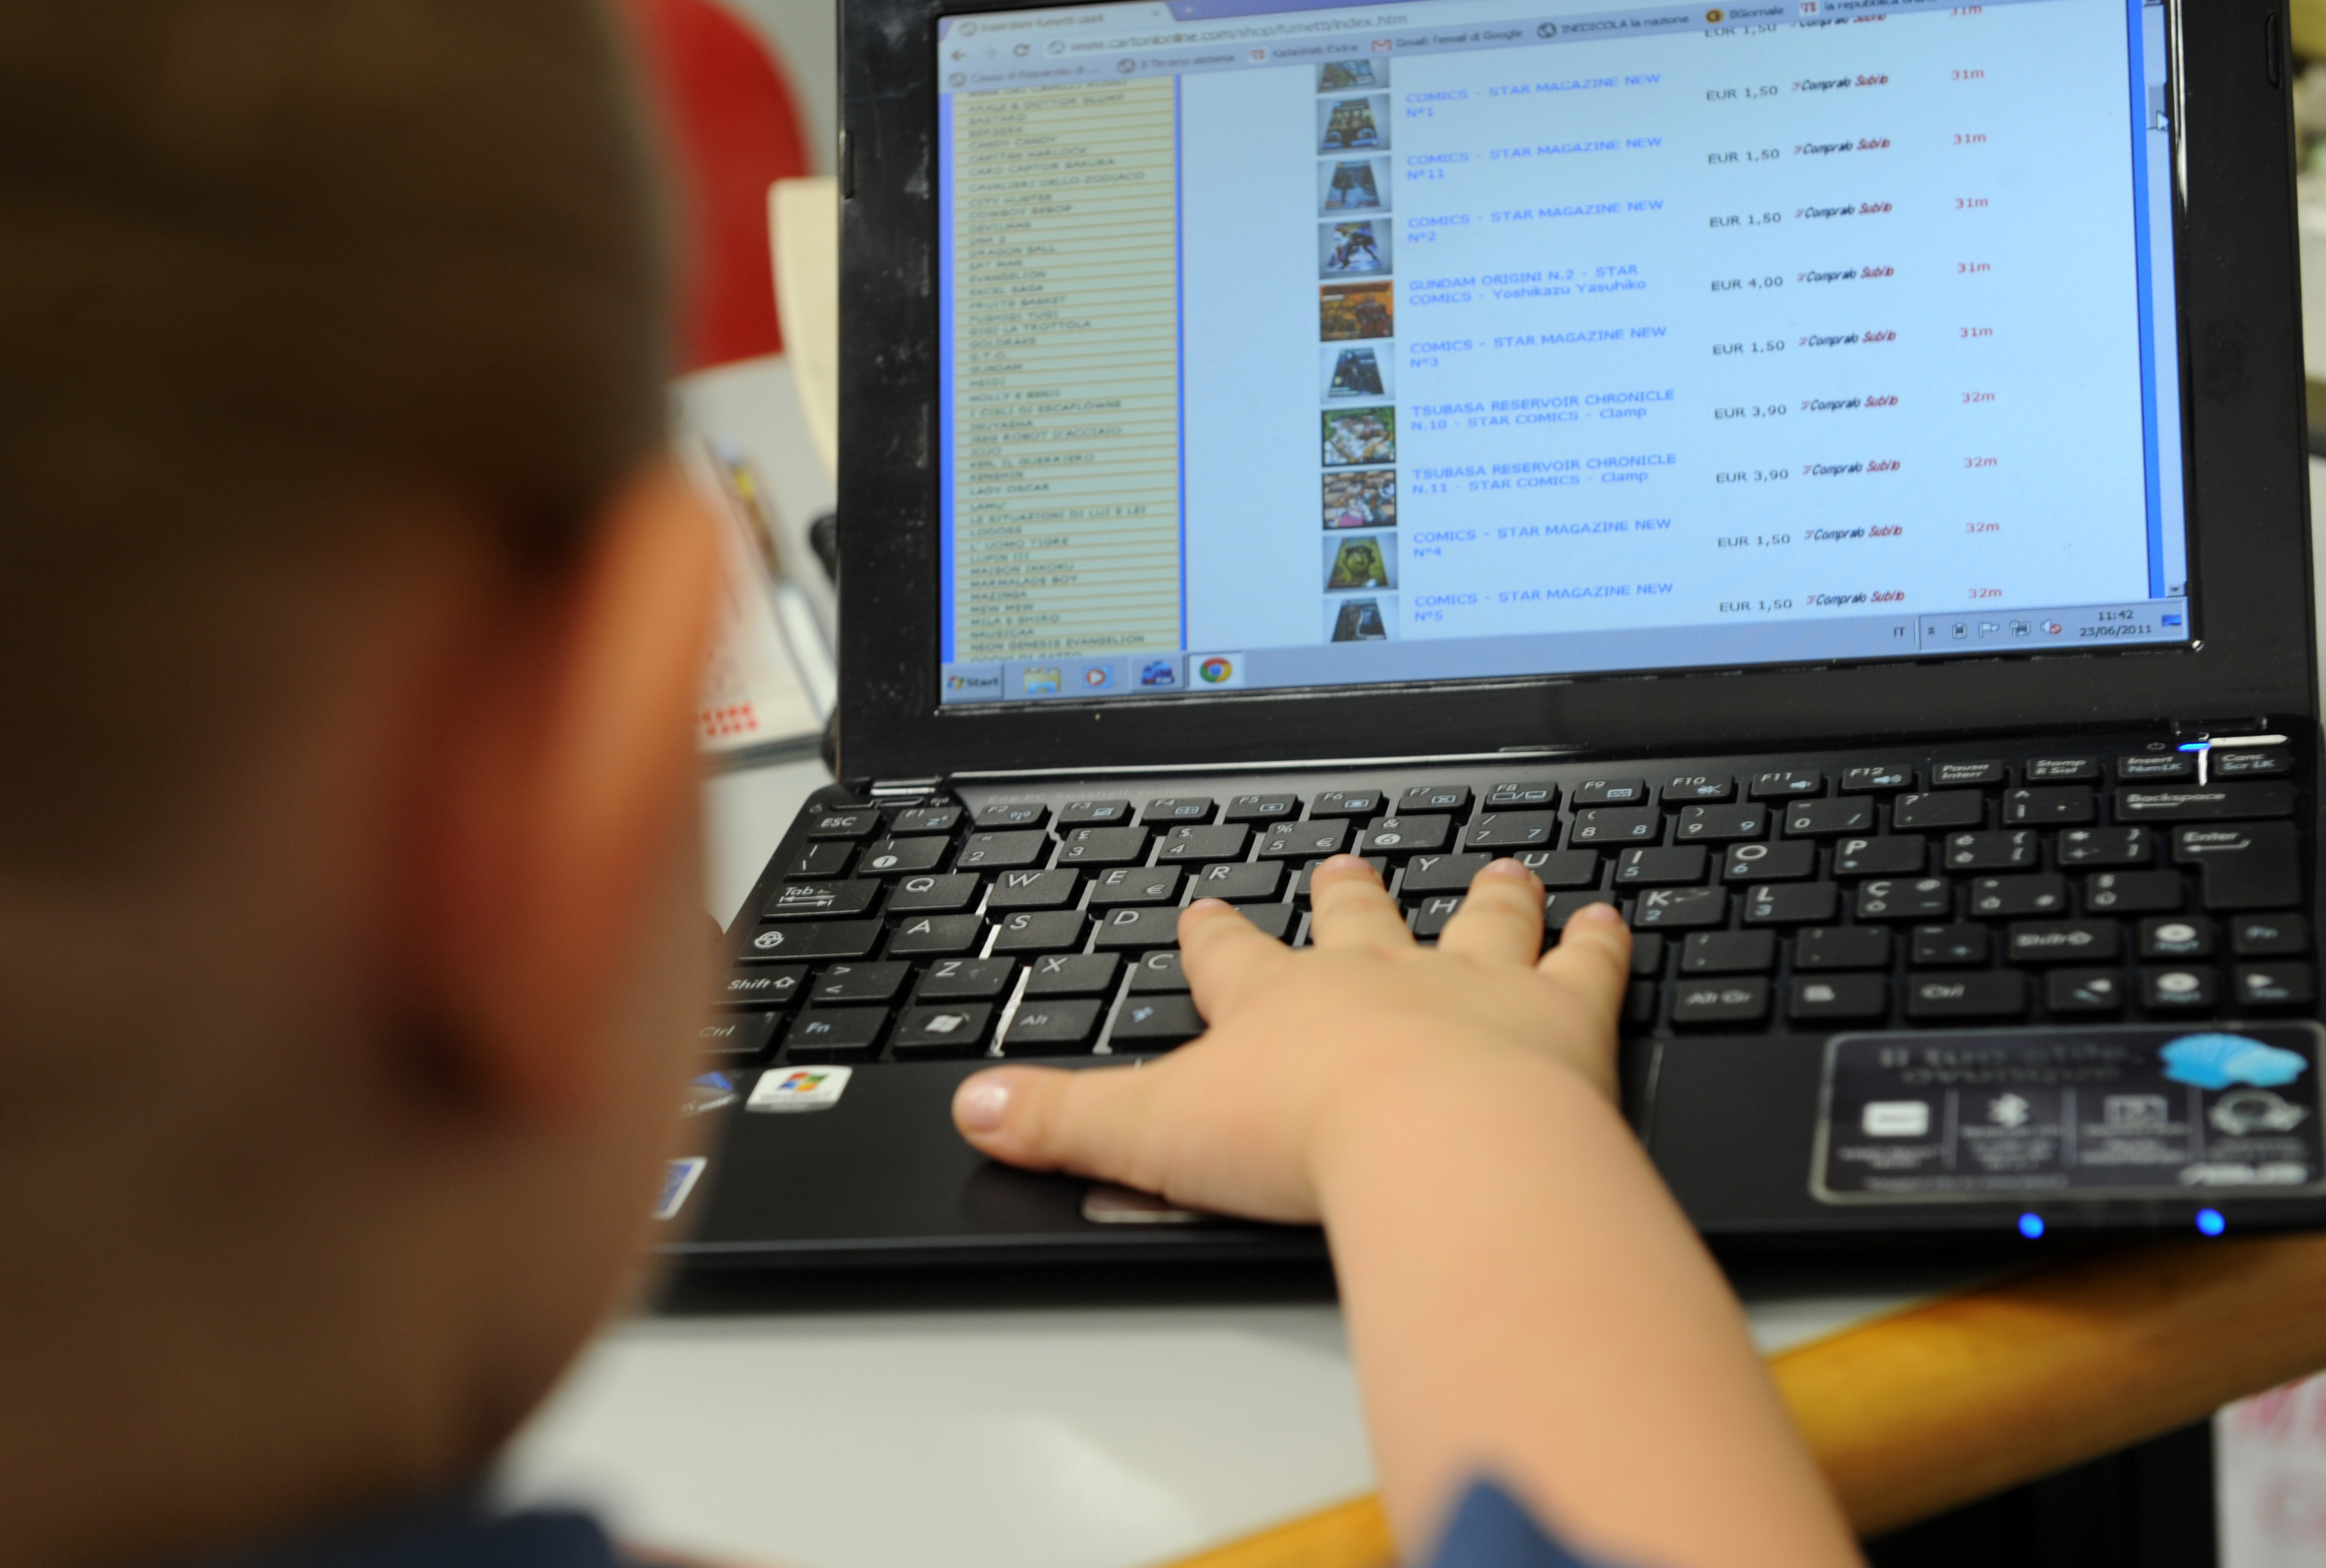 Usa, social media legati rischi suicidio